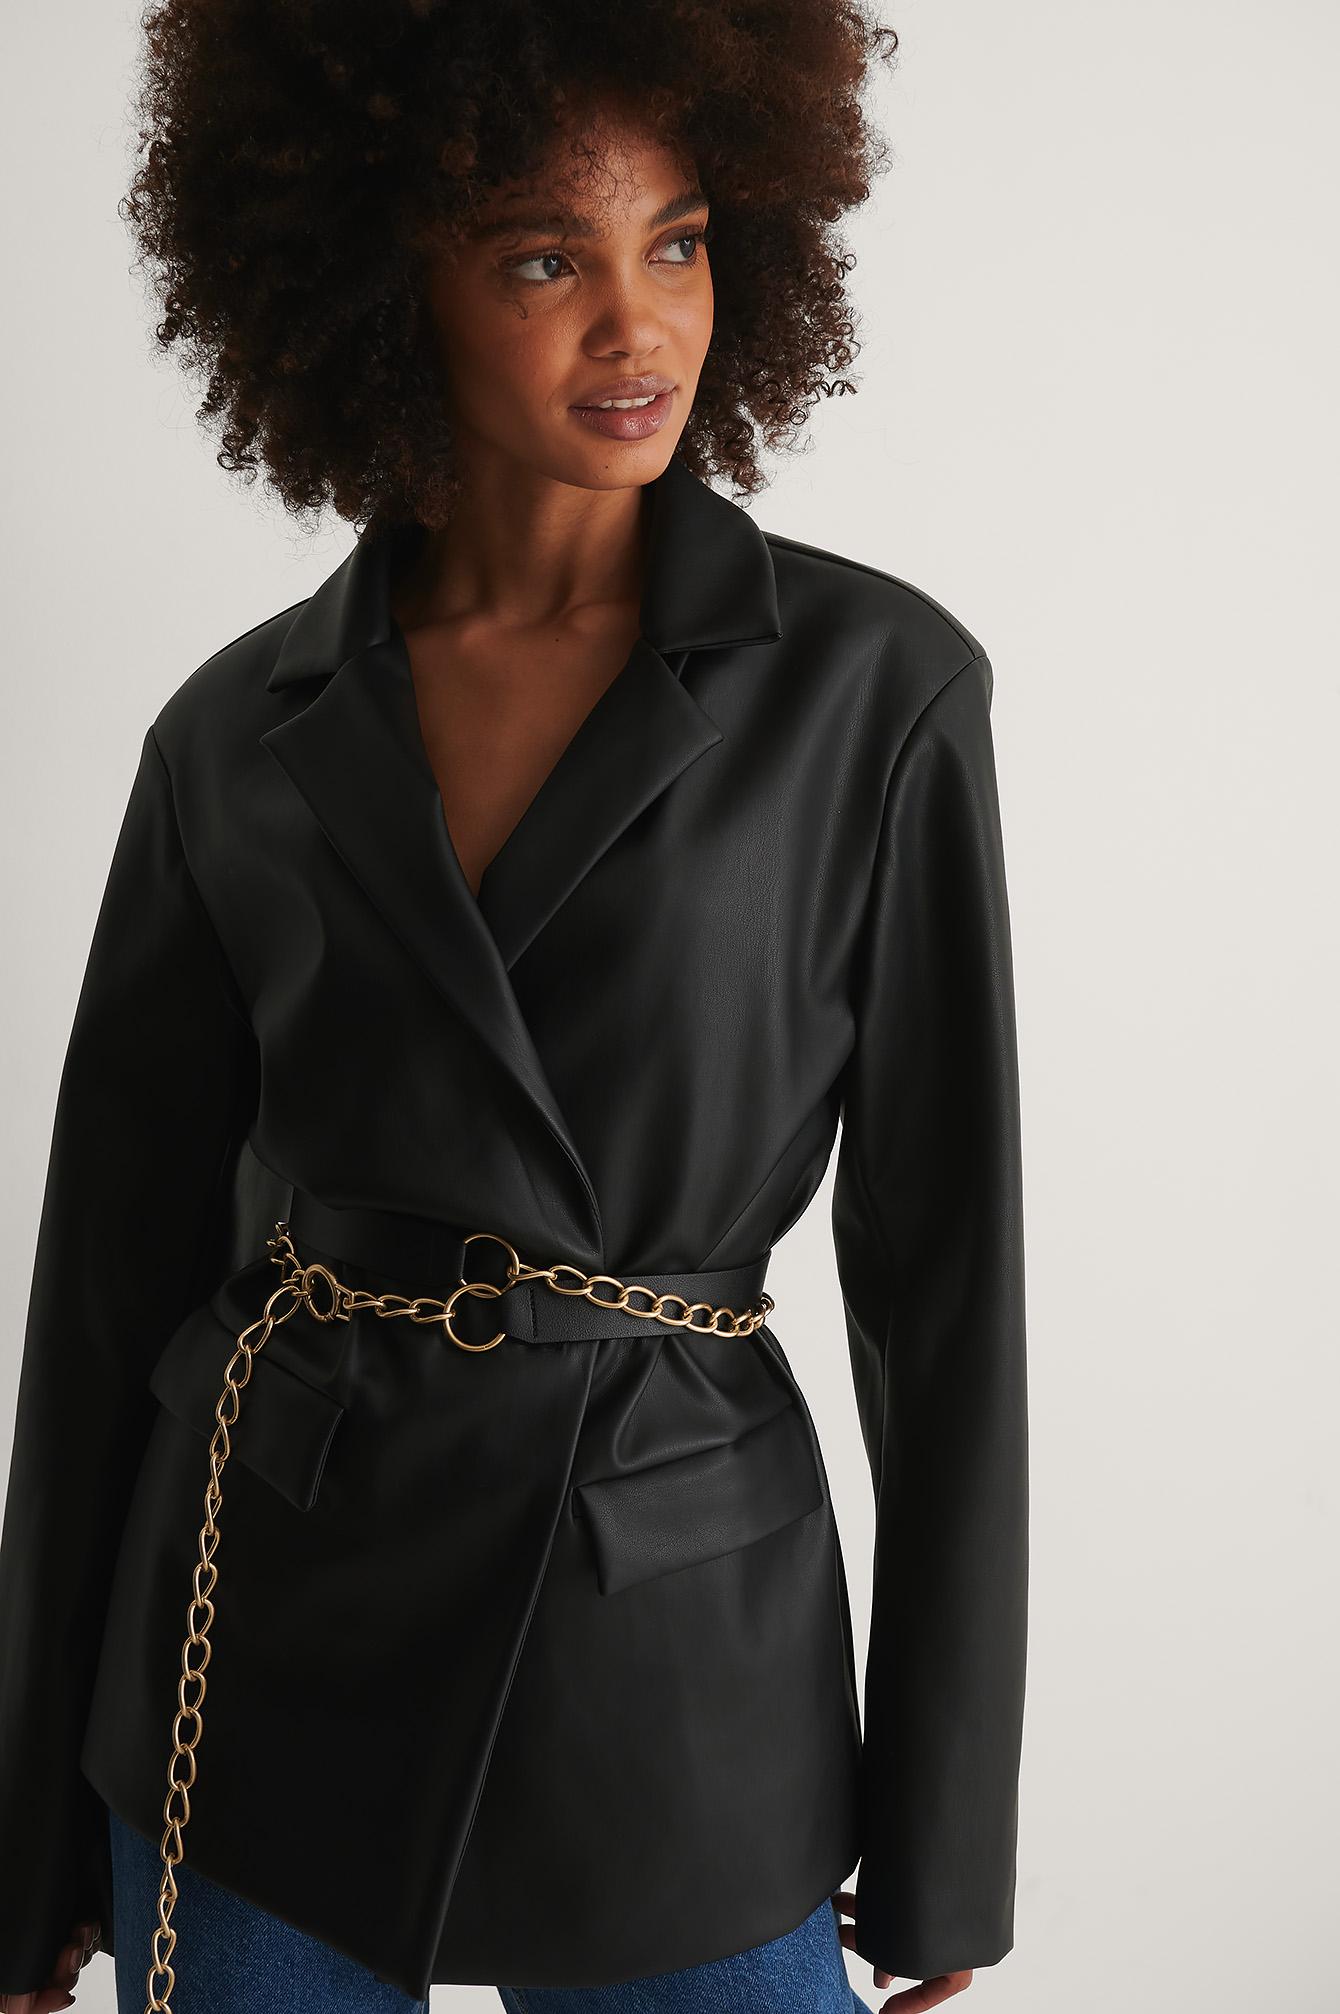 NA-KD Accessories Layered Chain Detail Belt - Black